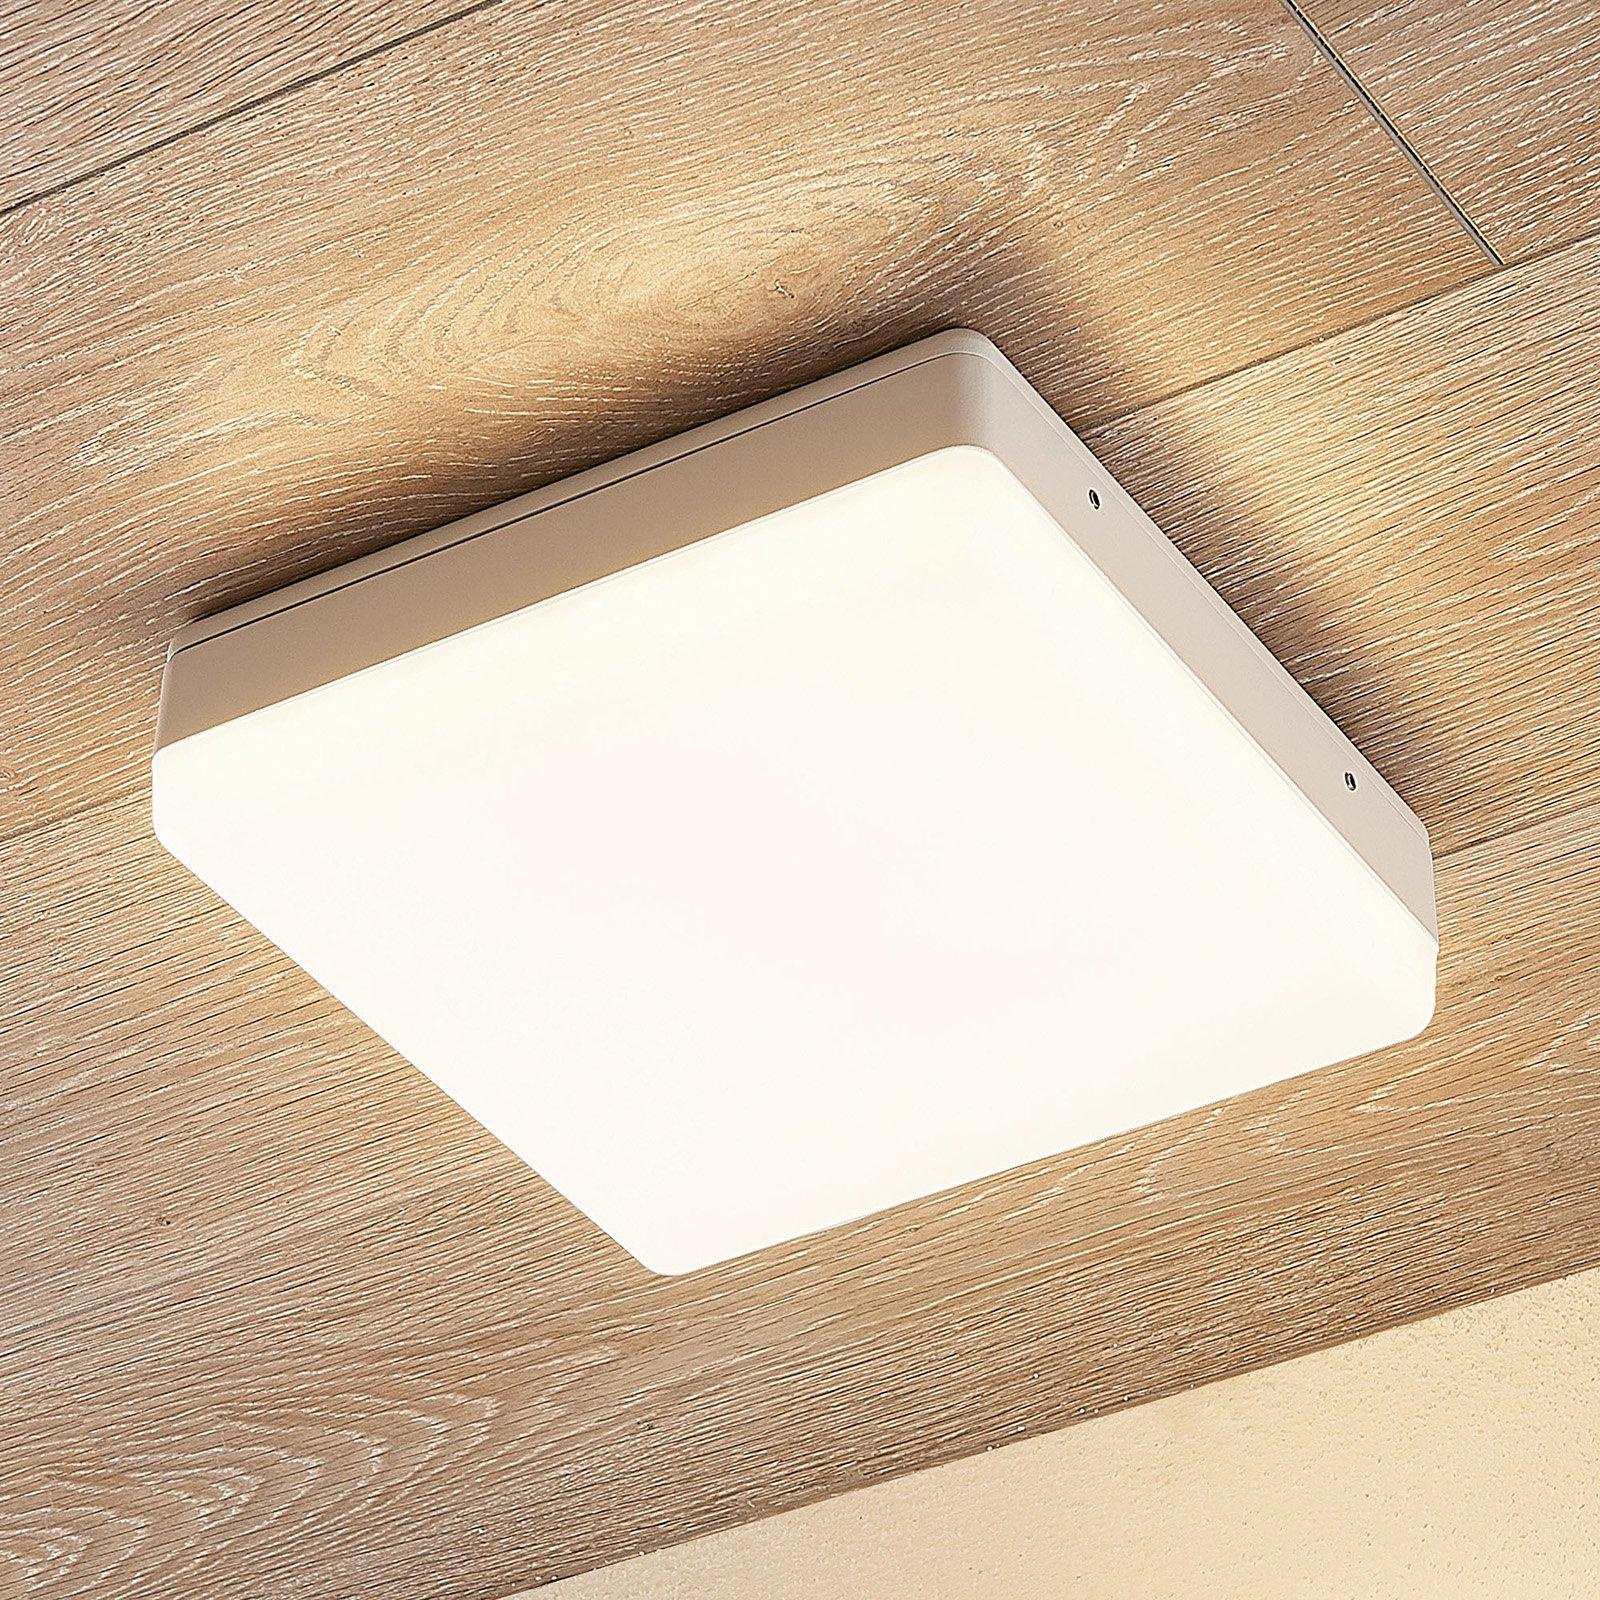 LED-taklampe Thilo, IP54, hvit, 24 cm